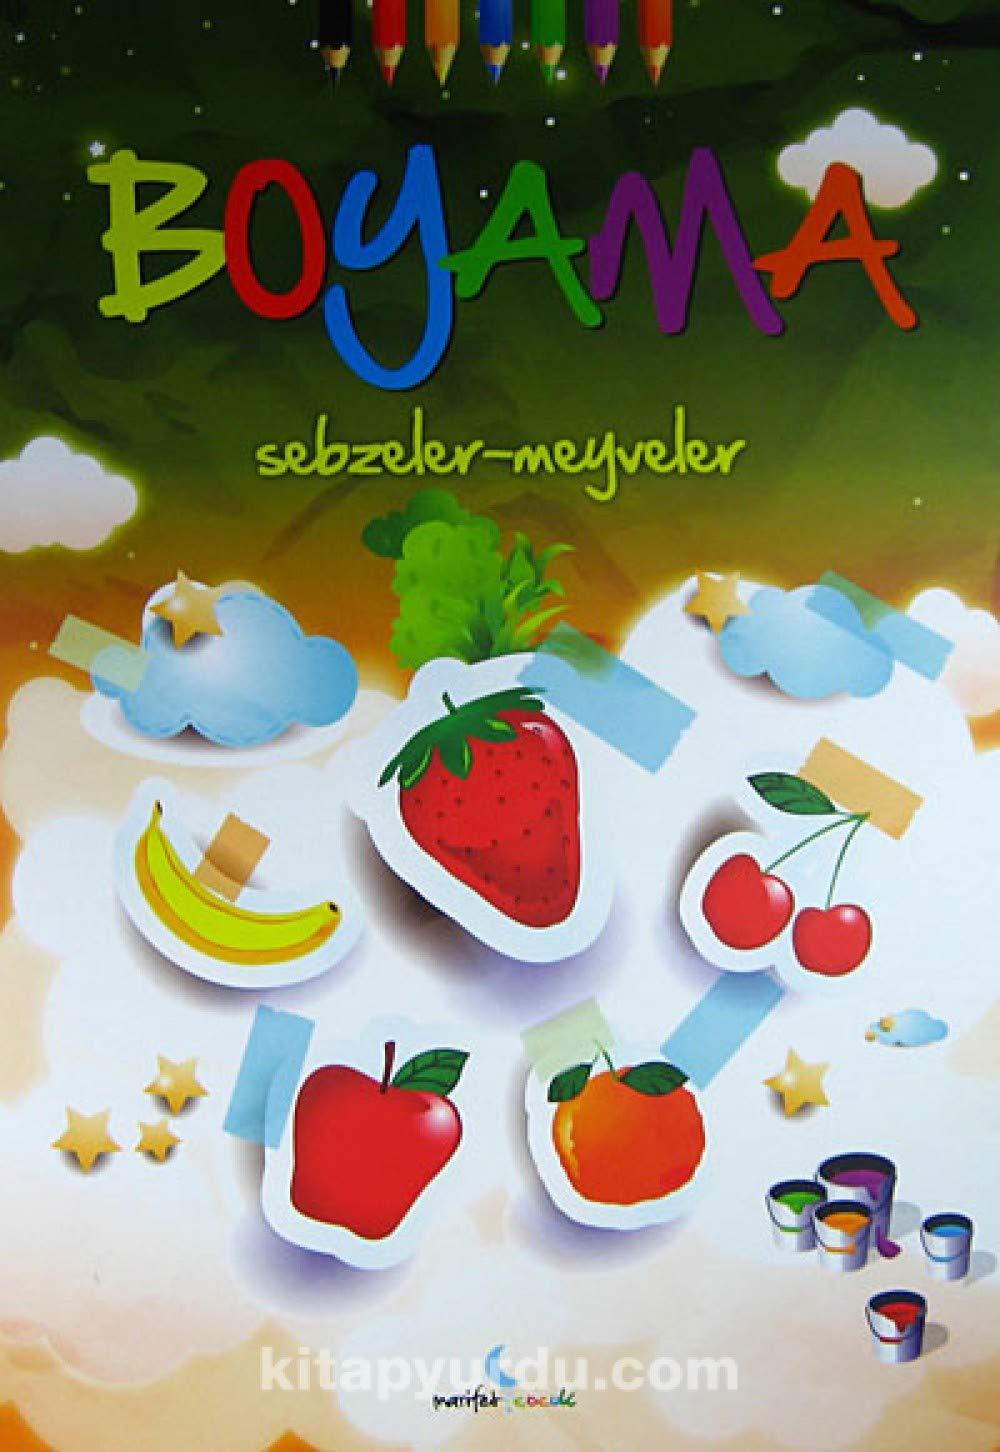 Boyama Sebzeler Meyveler 9786058522718 Amazoncom Books